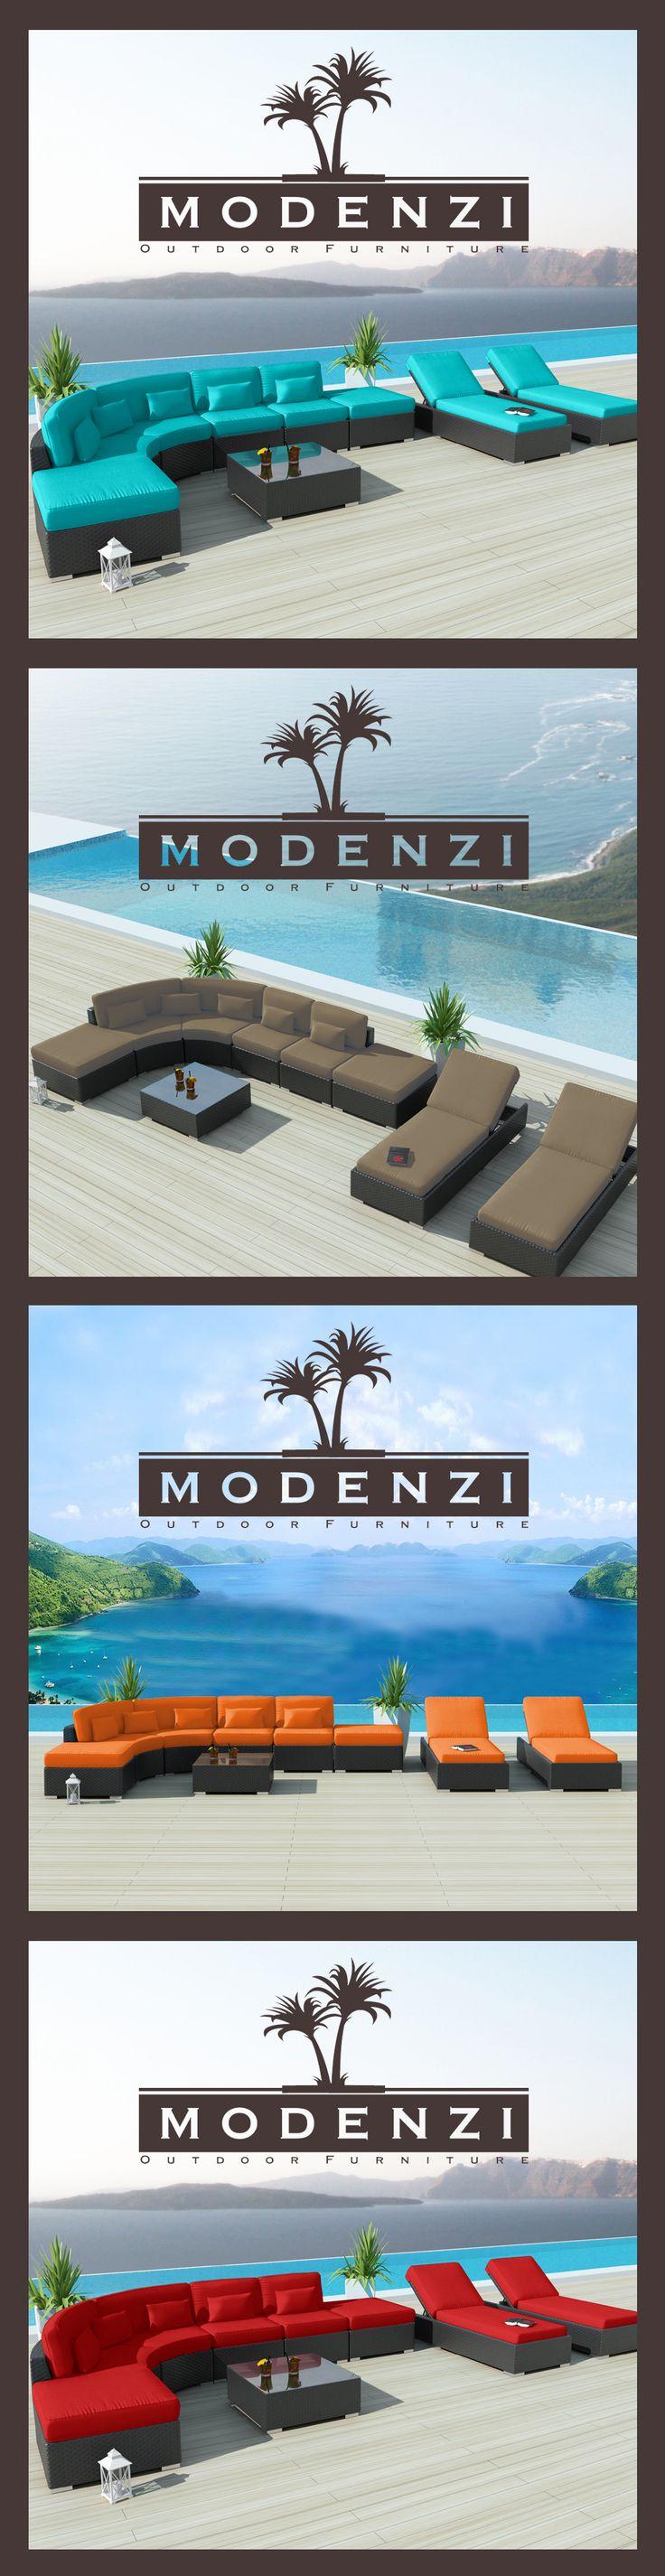 Modenzi High End Modern Wicker Furniture Sofa set 9Pcs Loungers